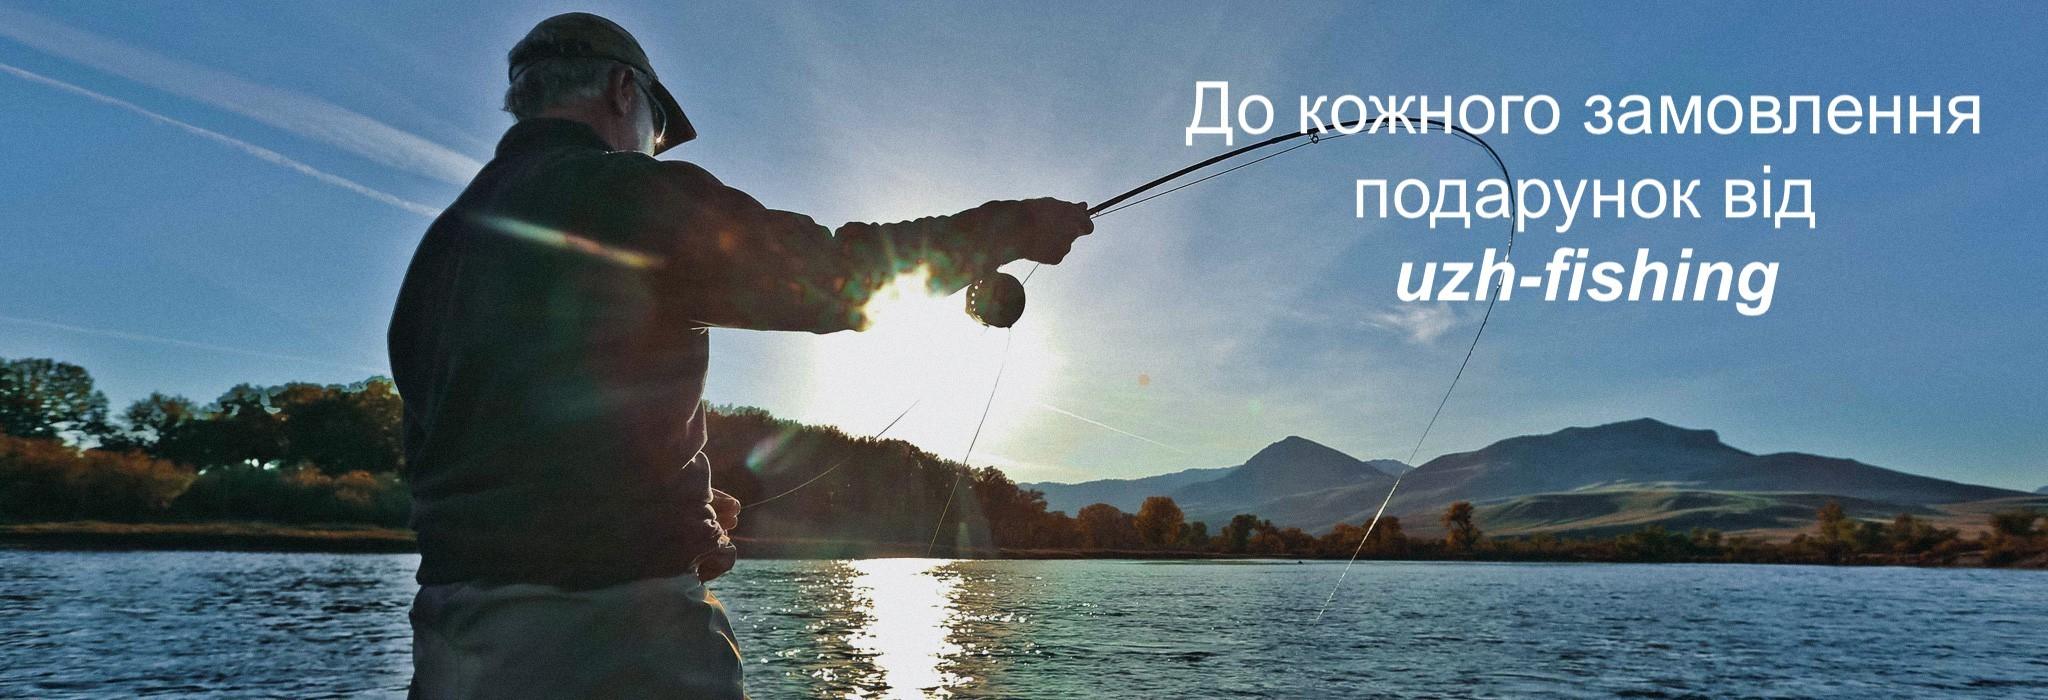 13e05c985906da Рыболовный магазин Uzh-Fishing – всё для рыбалки - UZH-FISHING.COM.UA